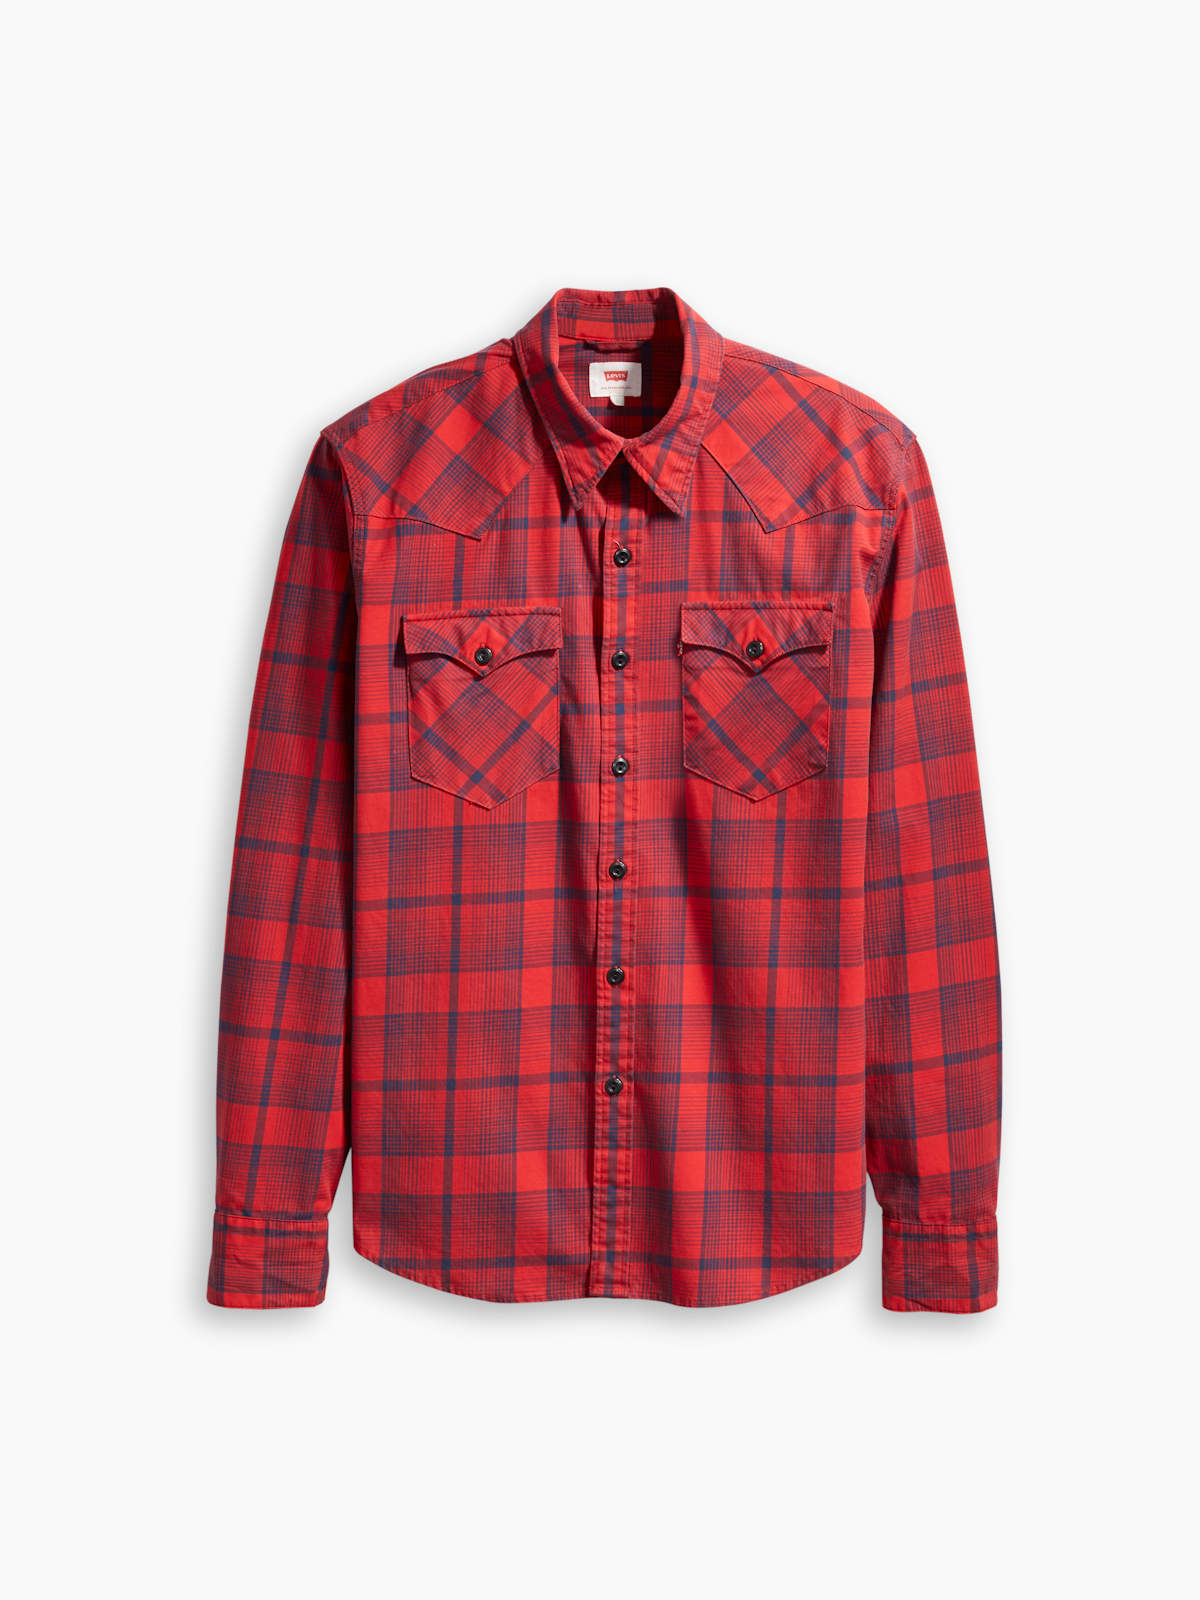 4cbc8b84 Levis ® Mens Shirt Barstow Western Nighthawk Chinese 65816-0257 | eBay